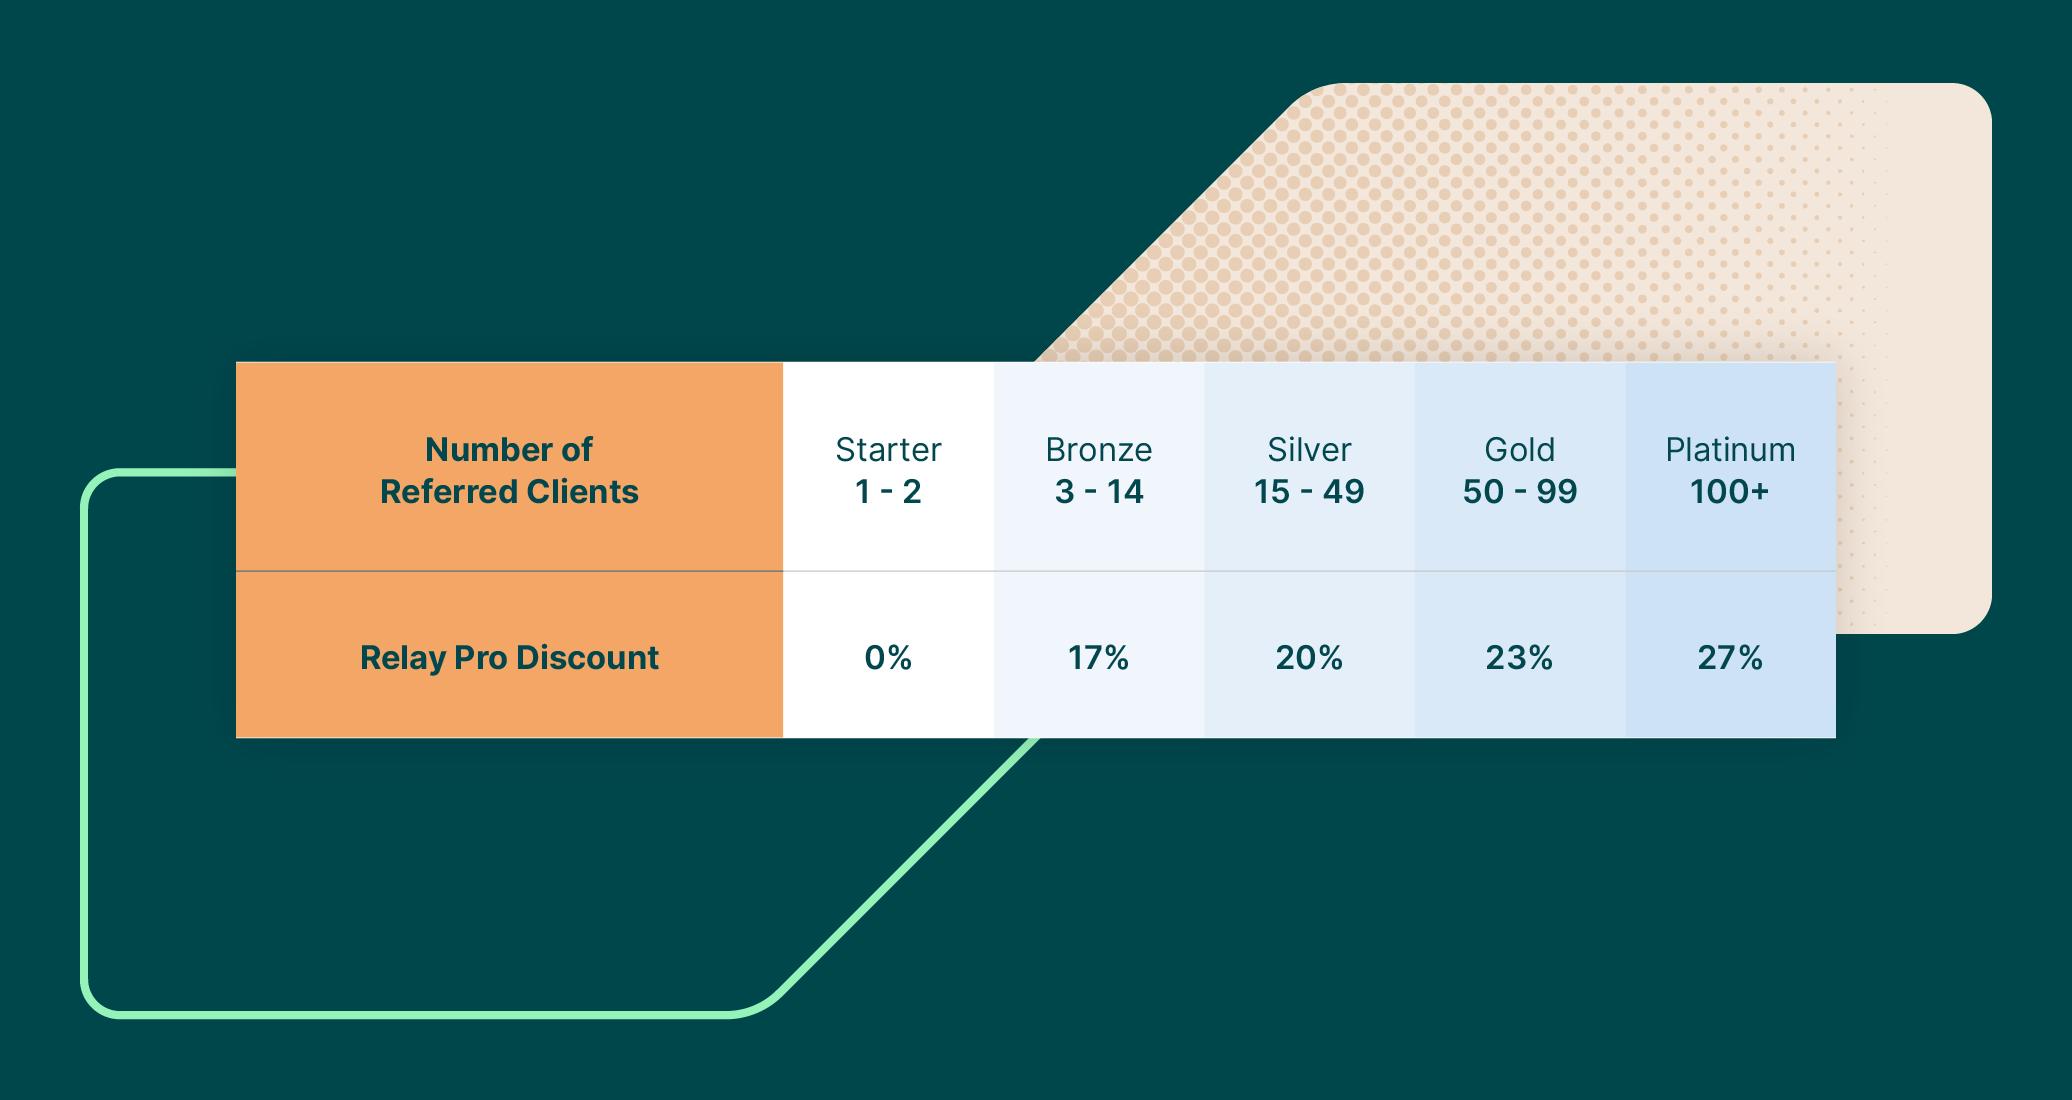 Relay Pro - Partner Benefits Table